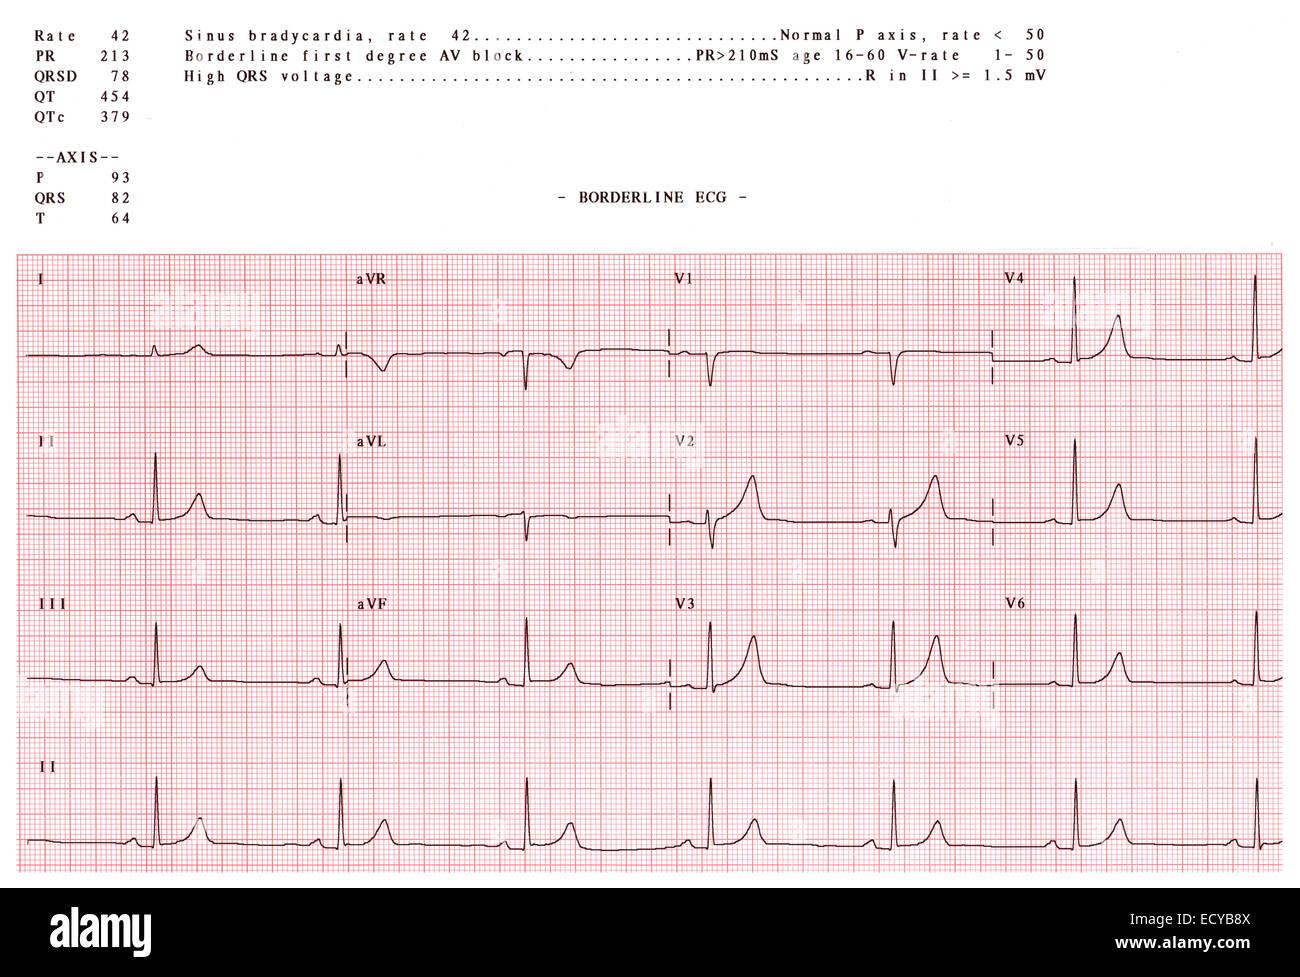 Abnormal electrocardiogram showing a sinus bradycardia. Stock Photo